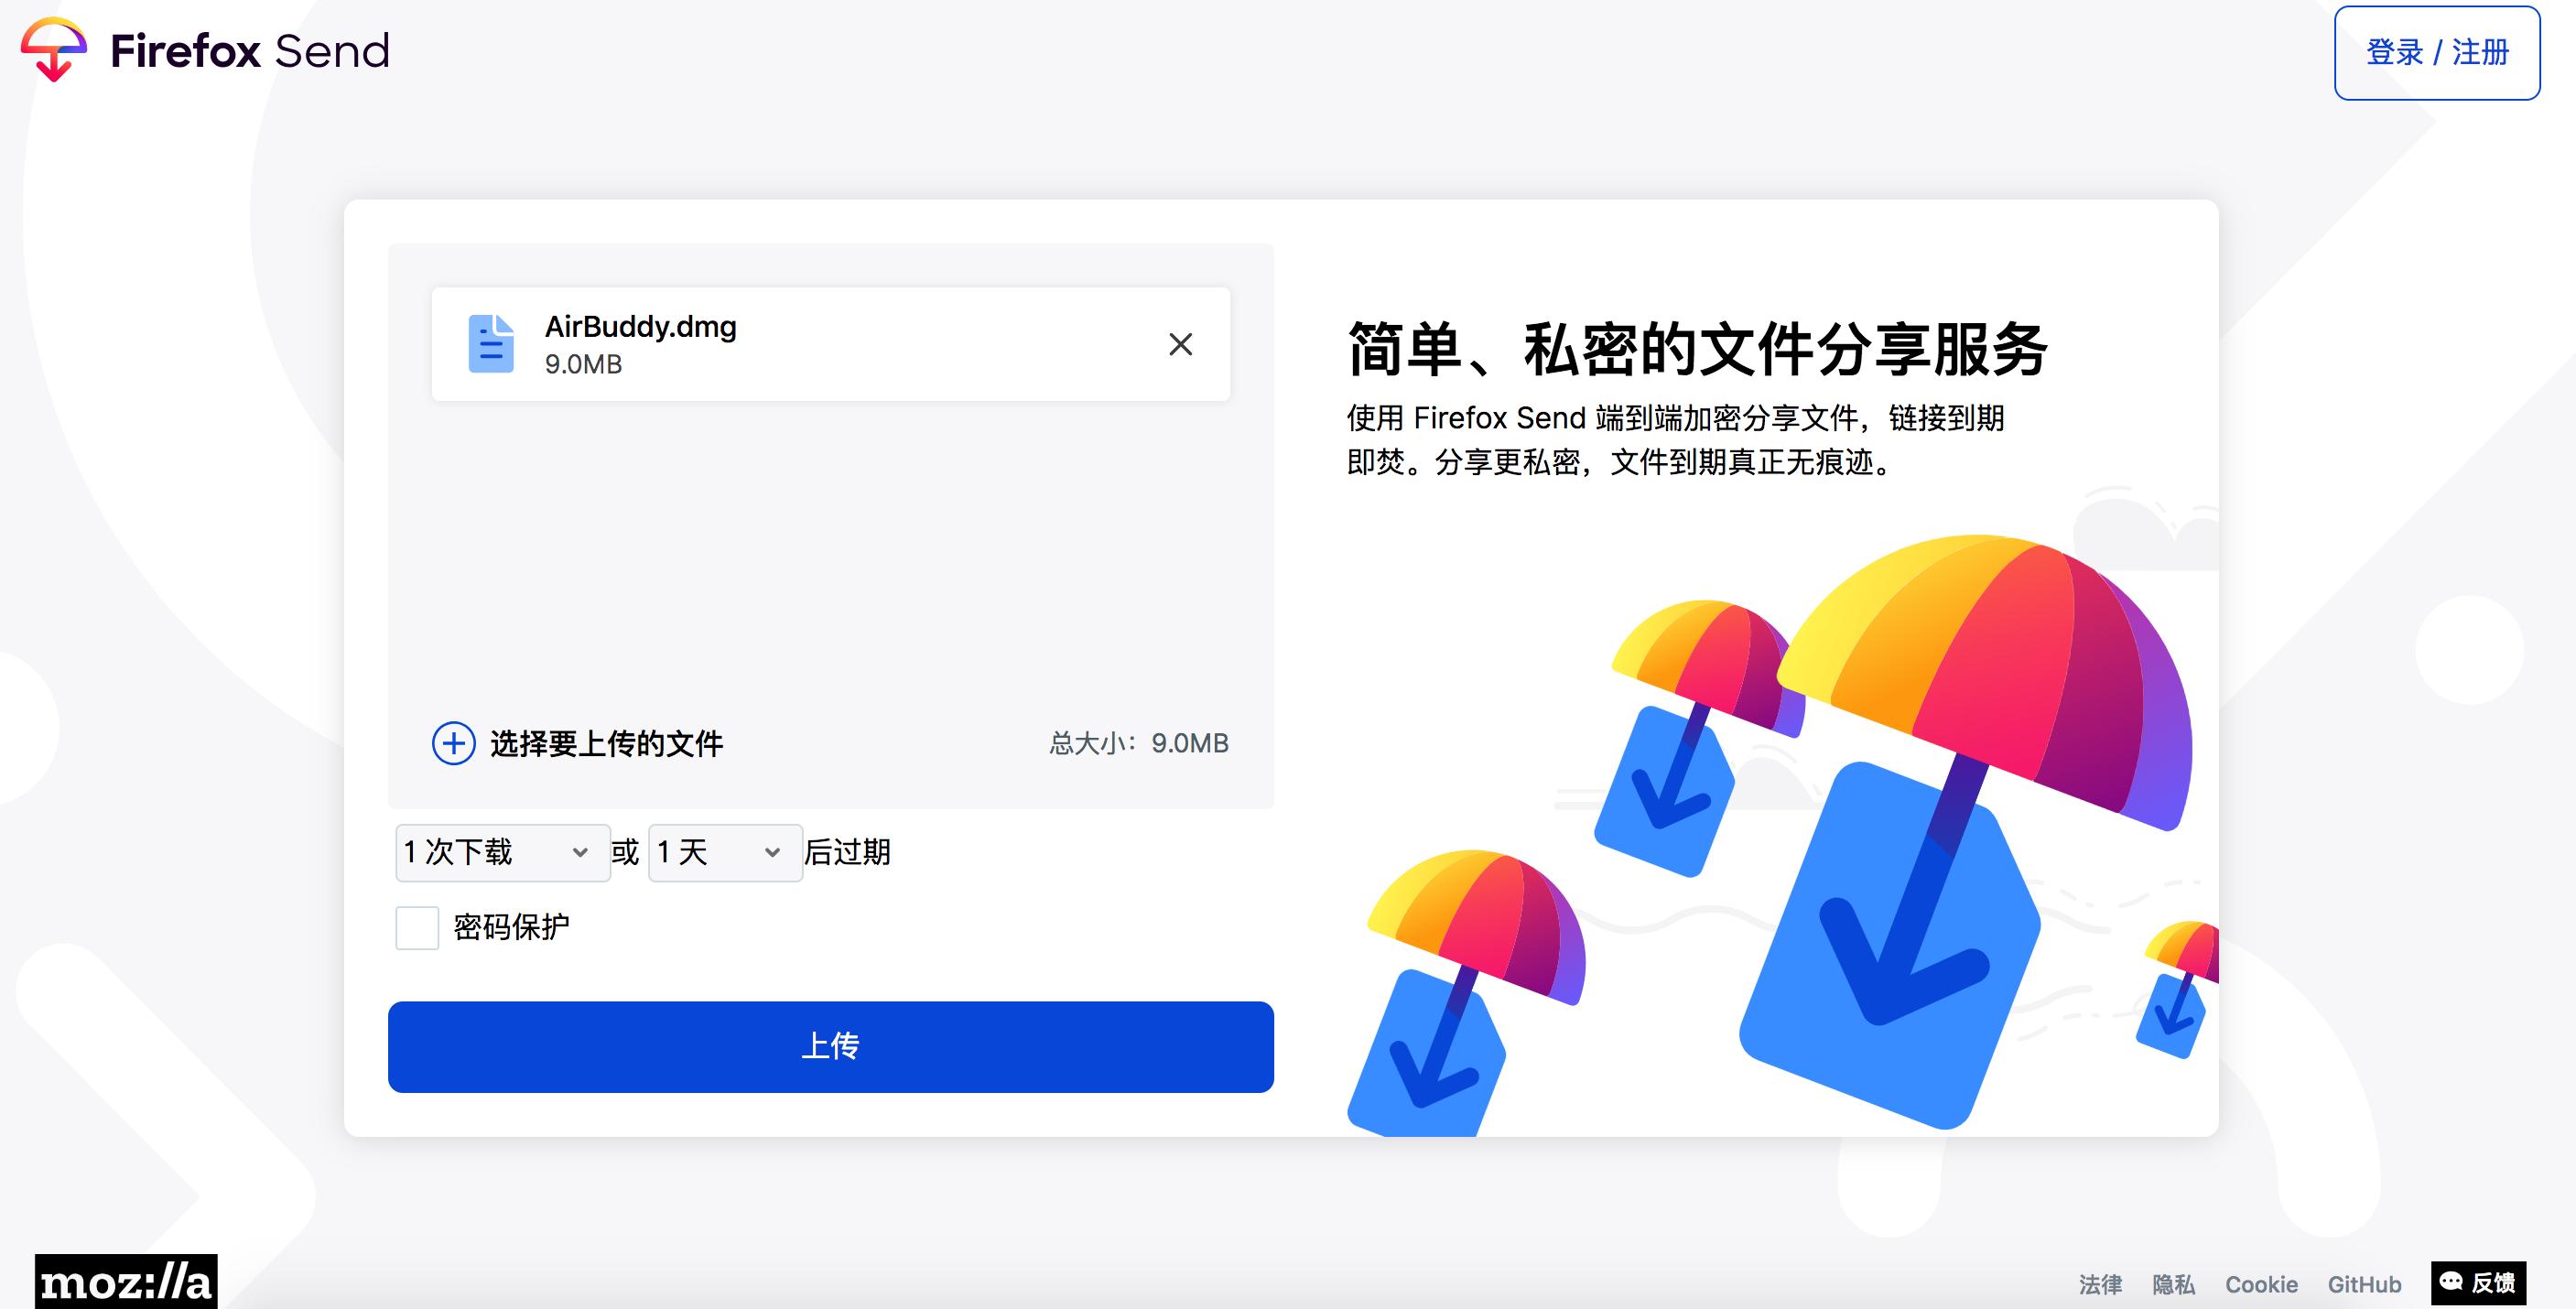 《Firefox Send-临时文件分享服务部署》